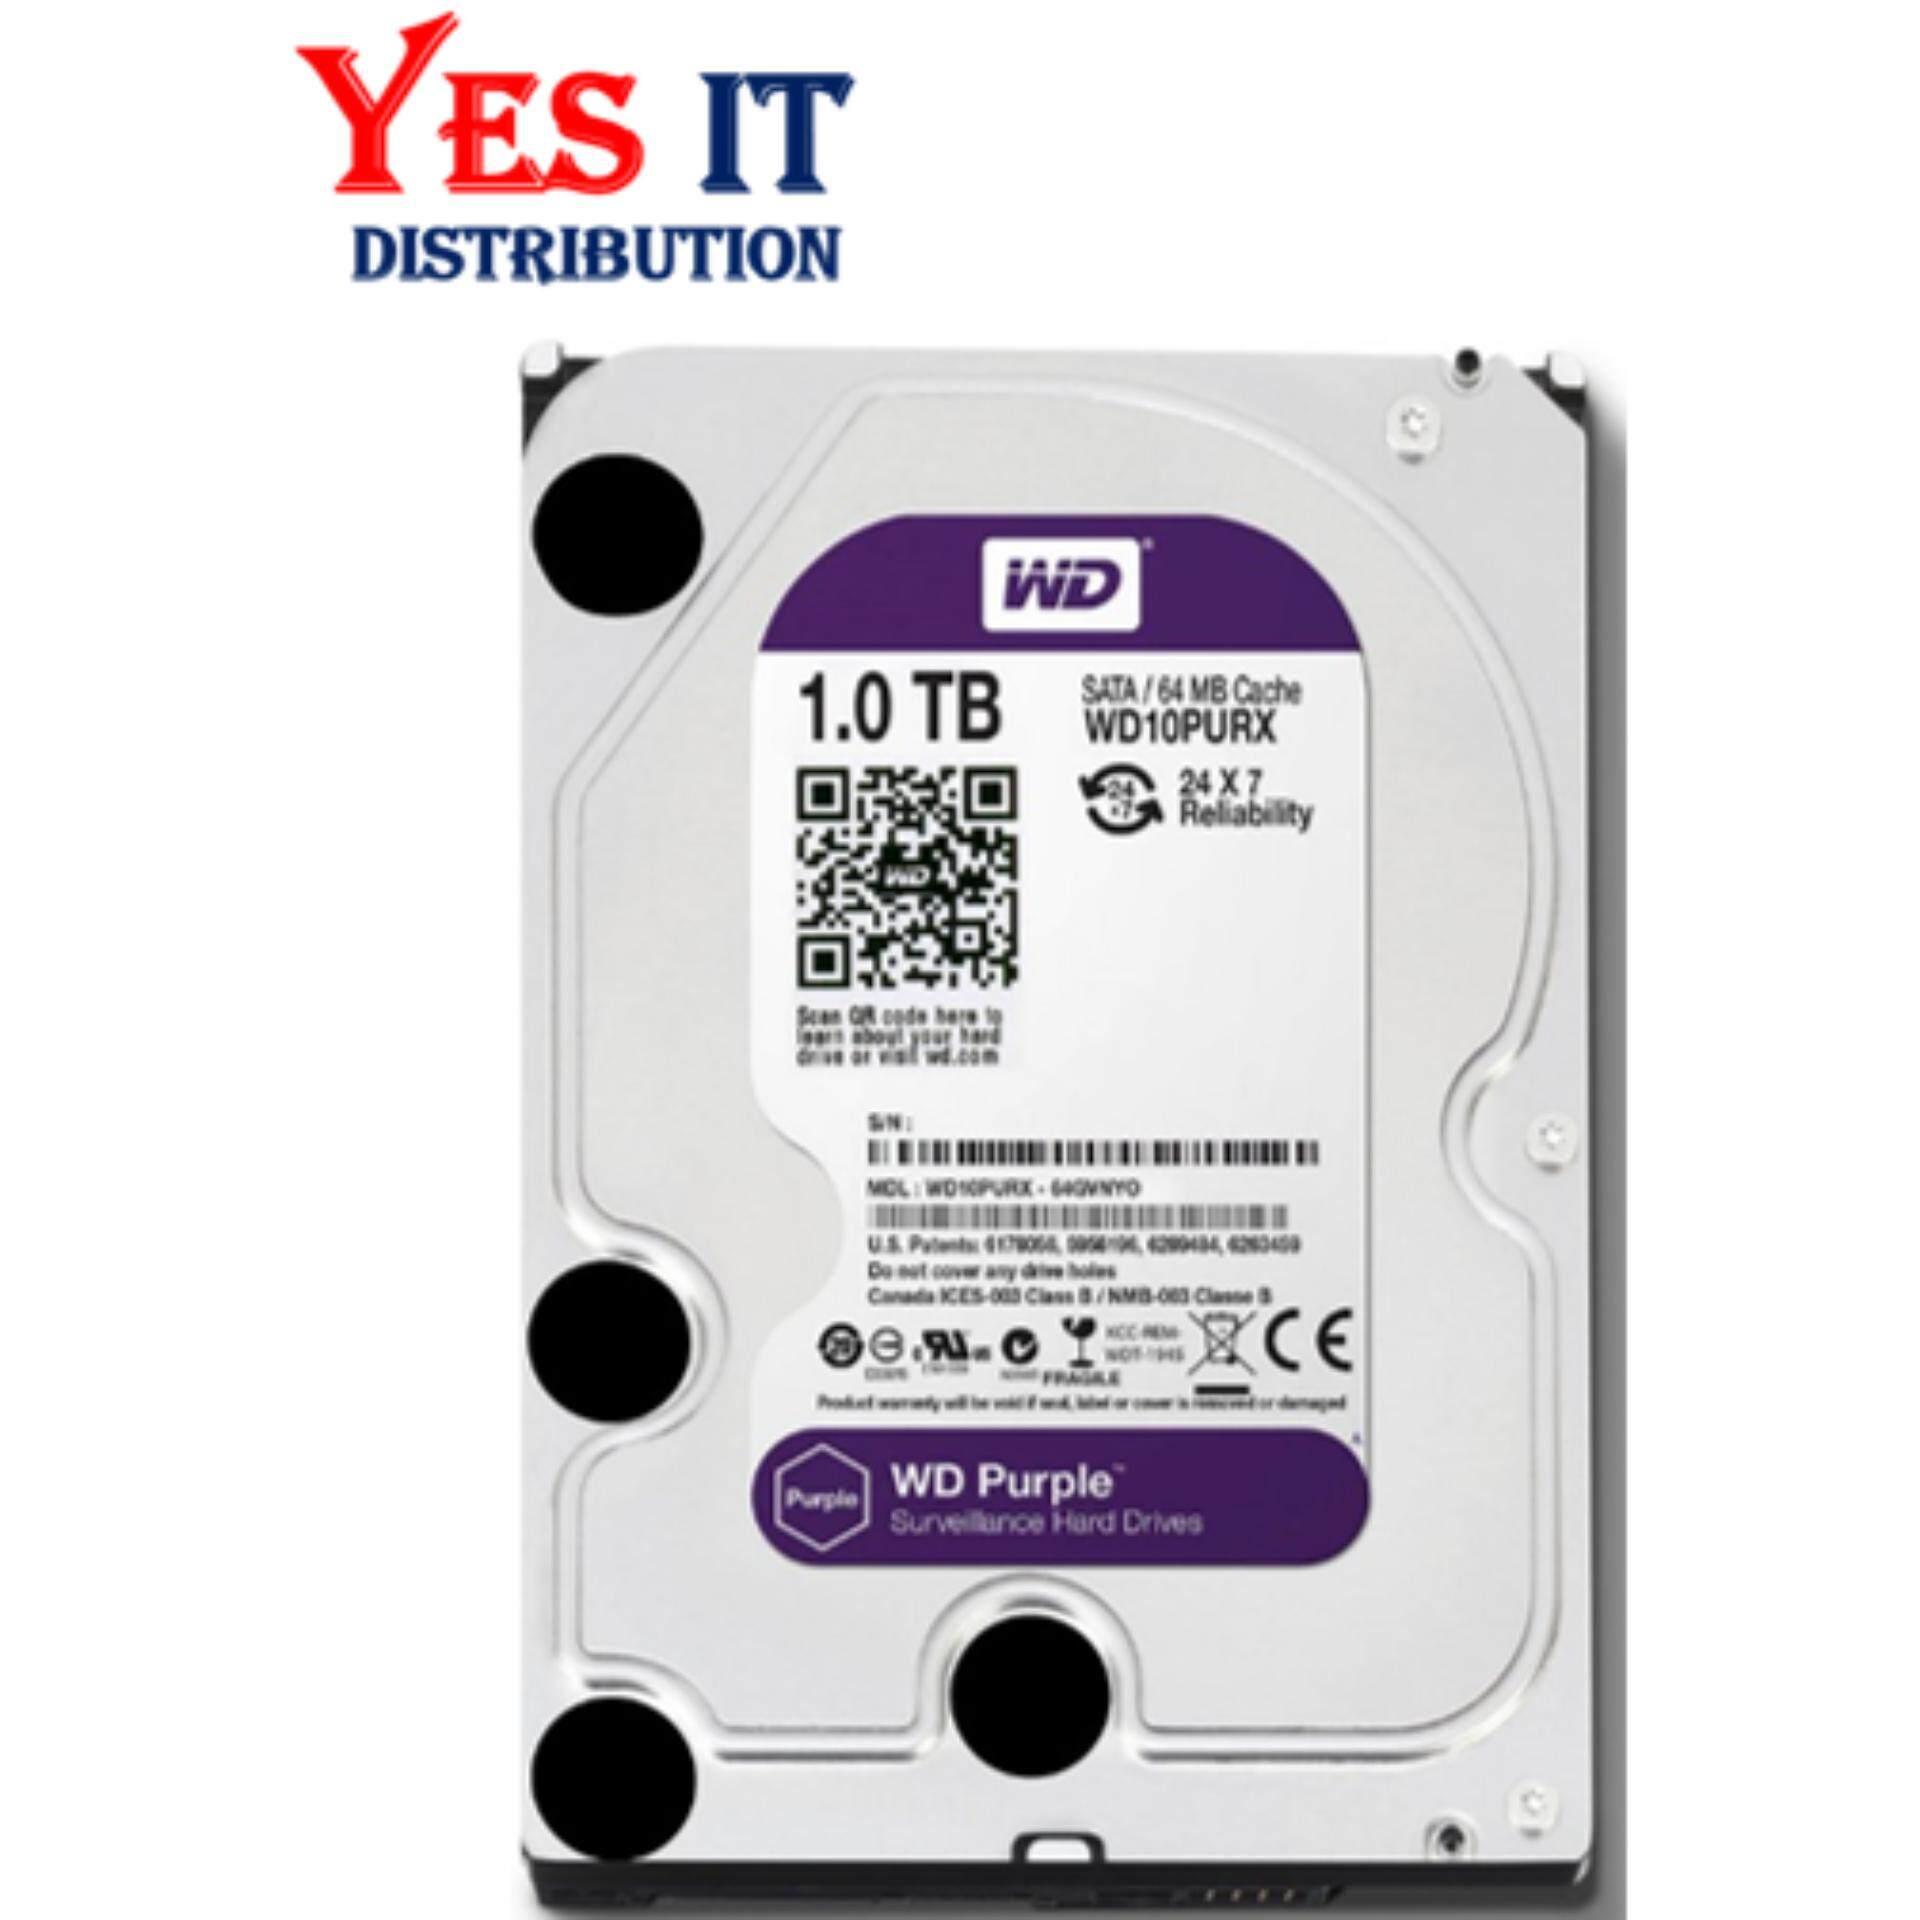 Internal Hard Drives With Best Online Price Malaysia Hardisk Hdd 25 80gb Wd Purple 1tb Surveillance Disk Drive Desktop